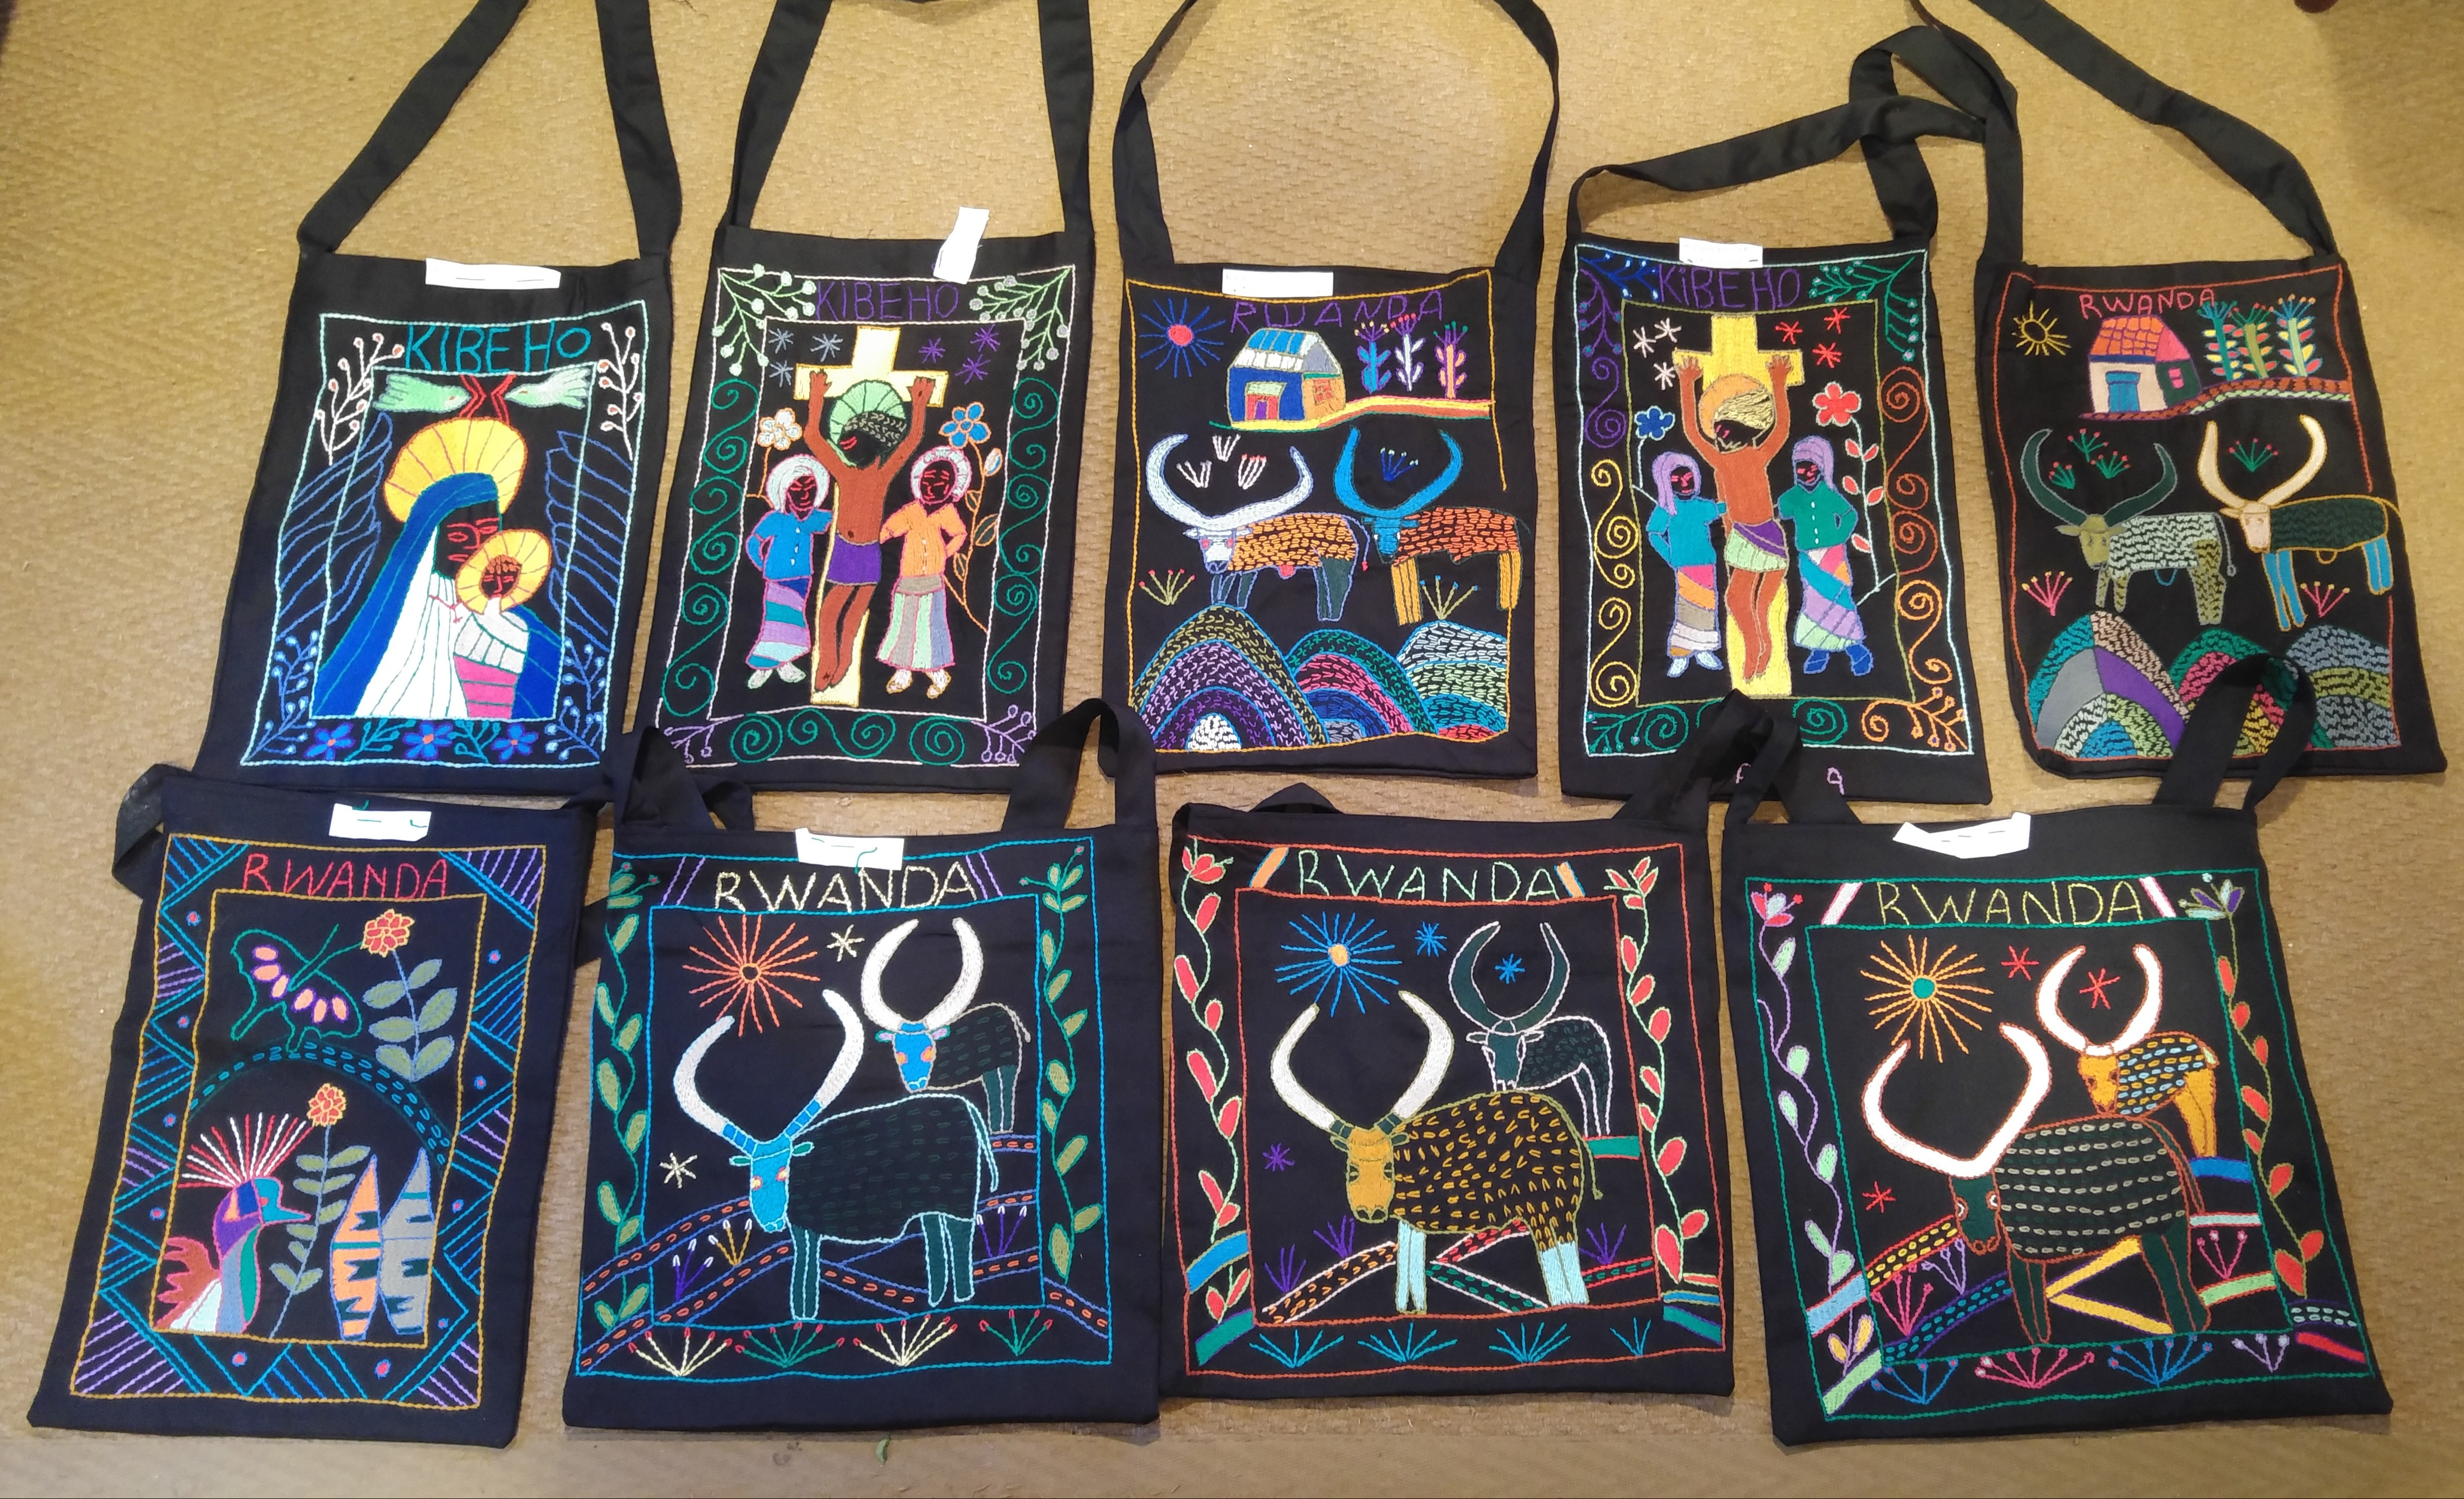 Rwandan embroideries